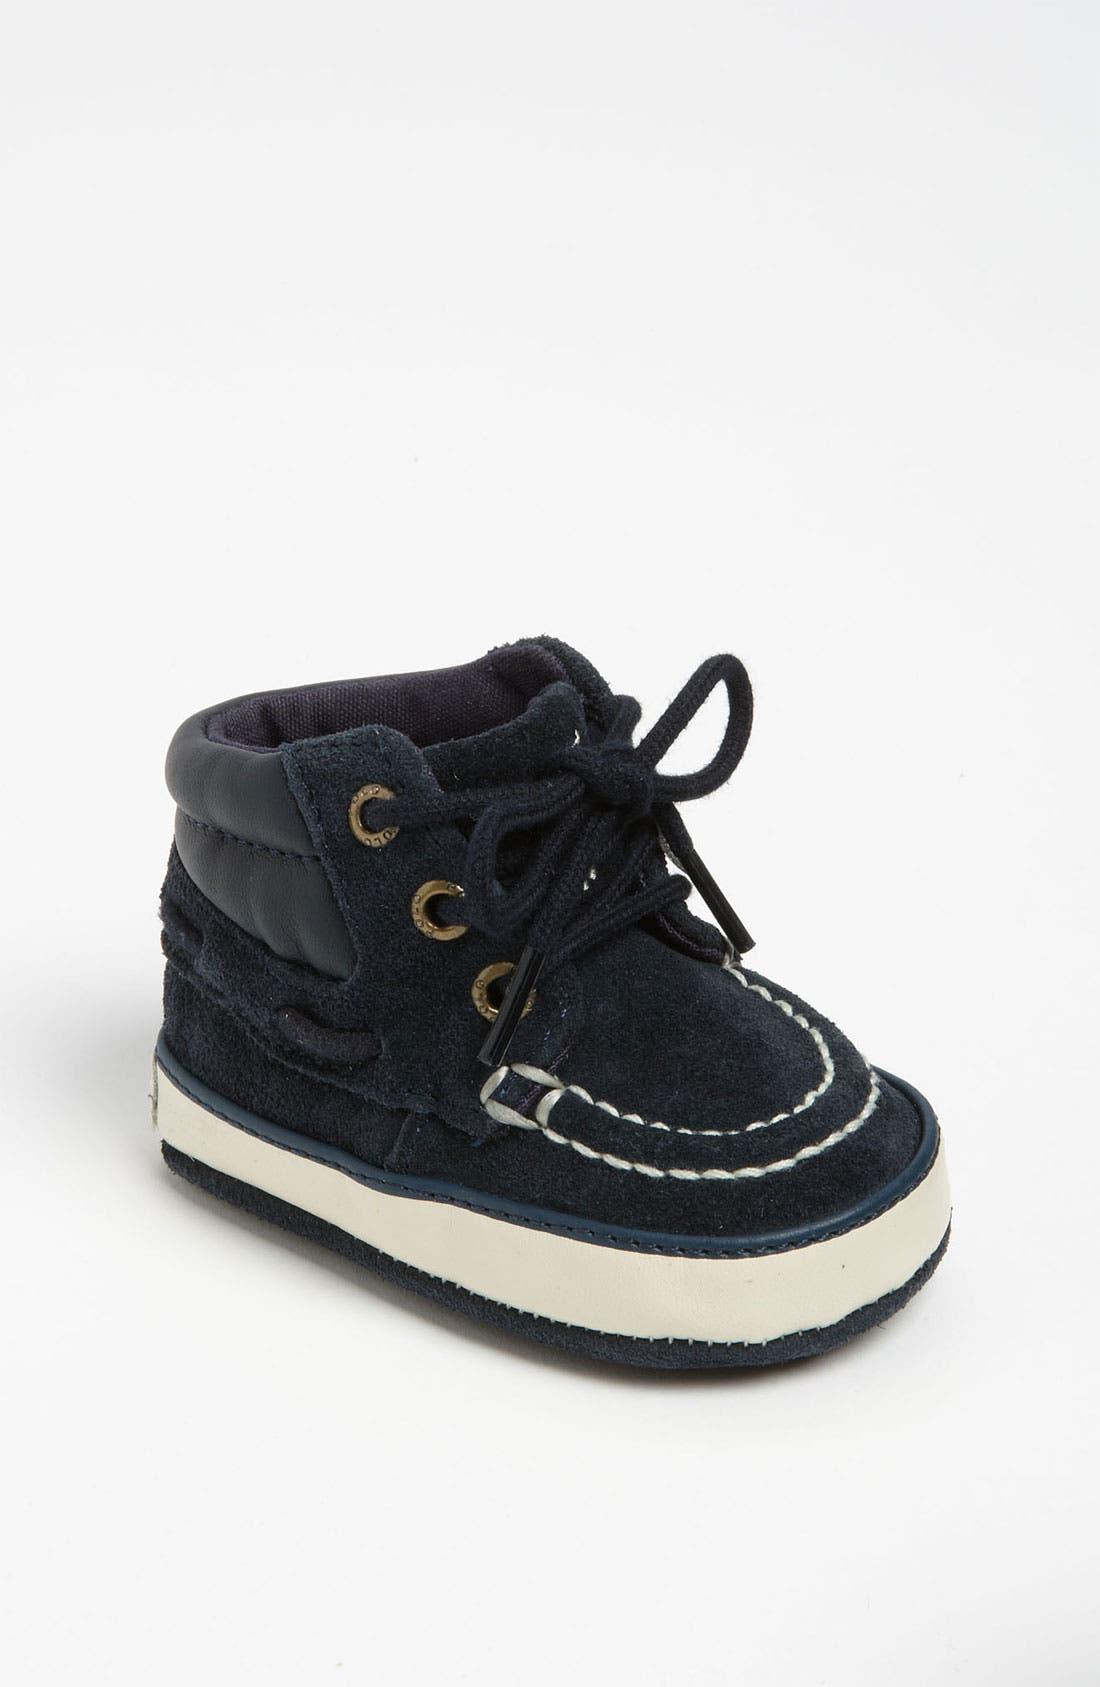 Main Image - Ralph Lauren Layette 'Sanders' Crib Shoe (Baby)